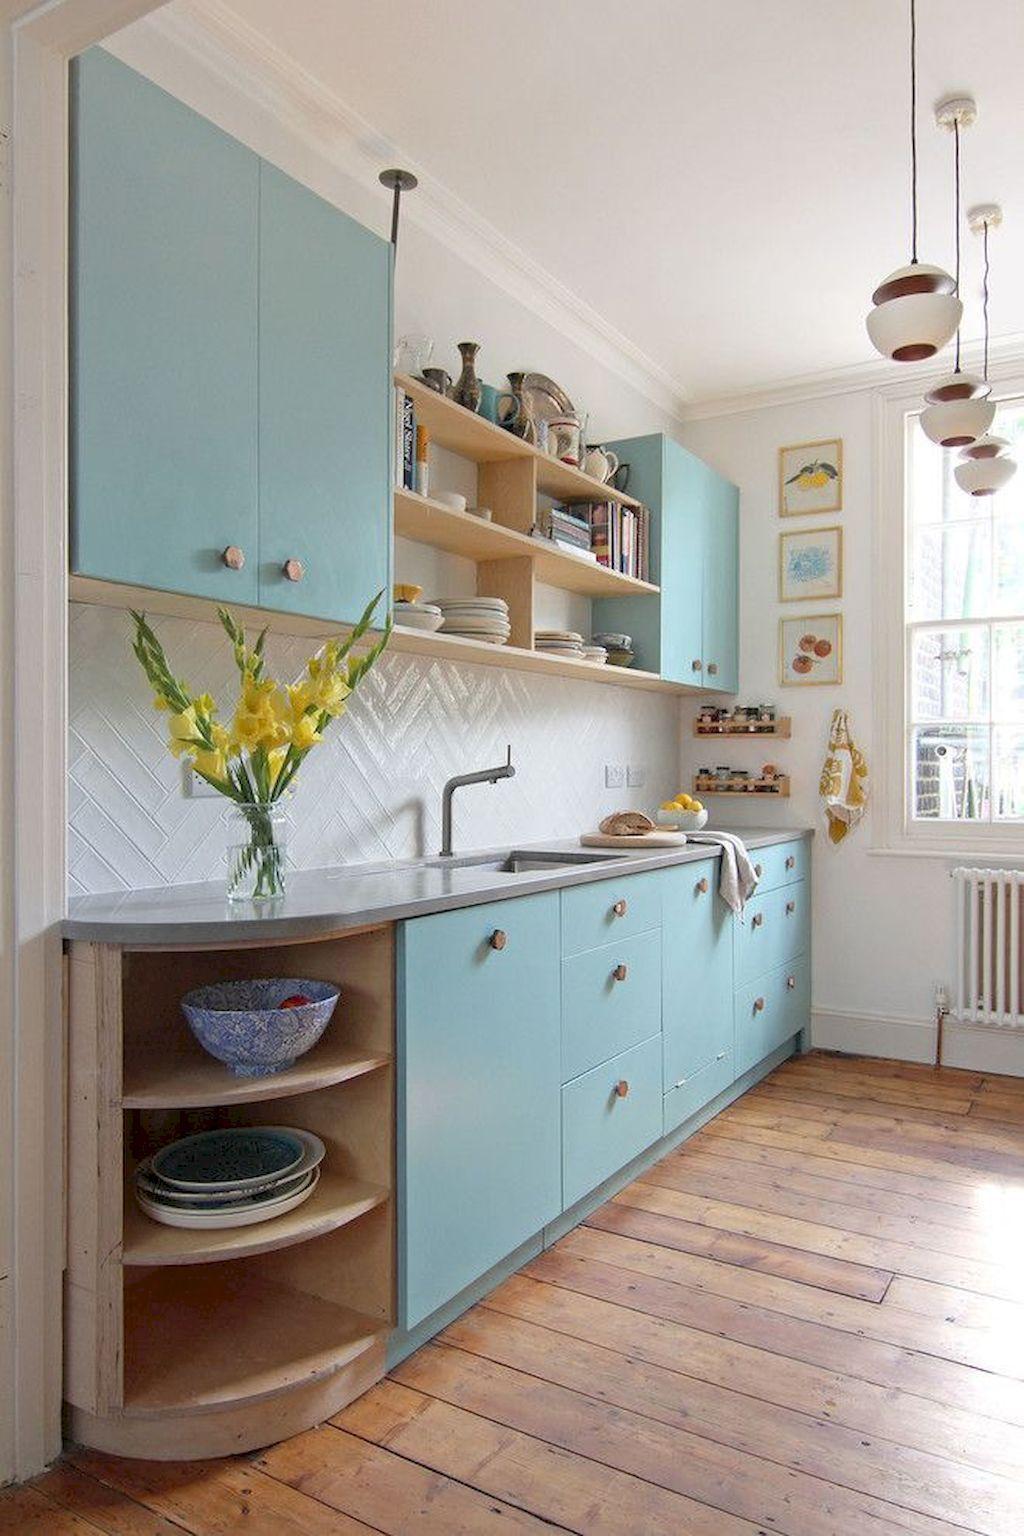 Cuisine Blanche Et Bleu how to decorate your kitchen effortless? | cuisines design